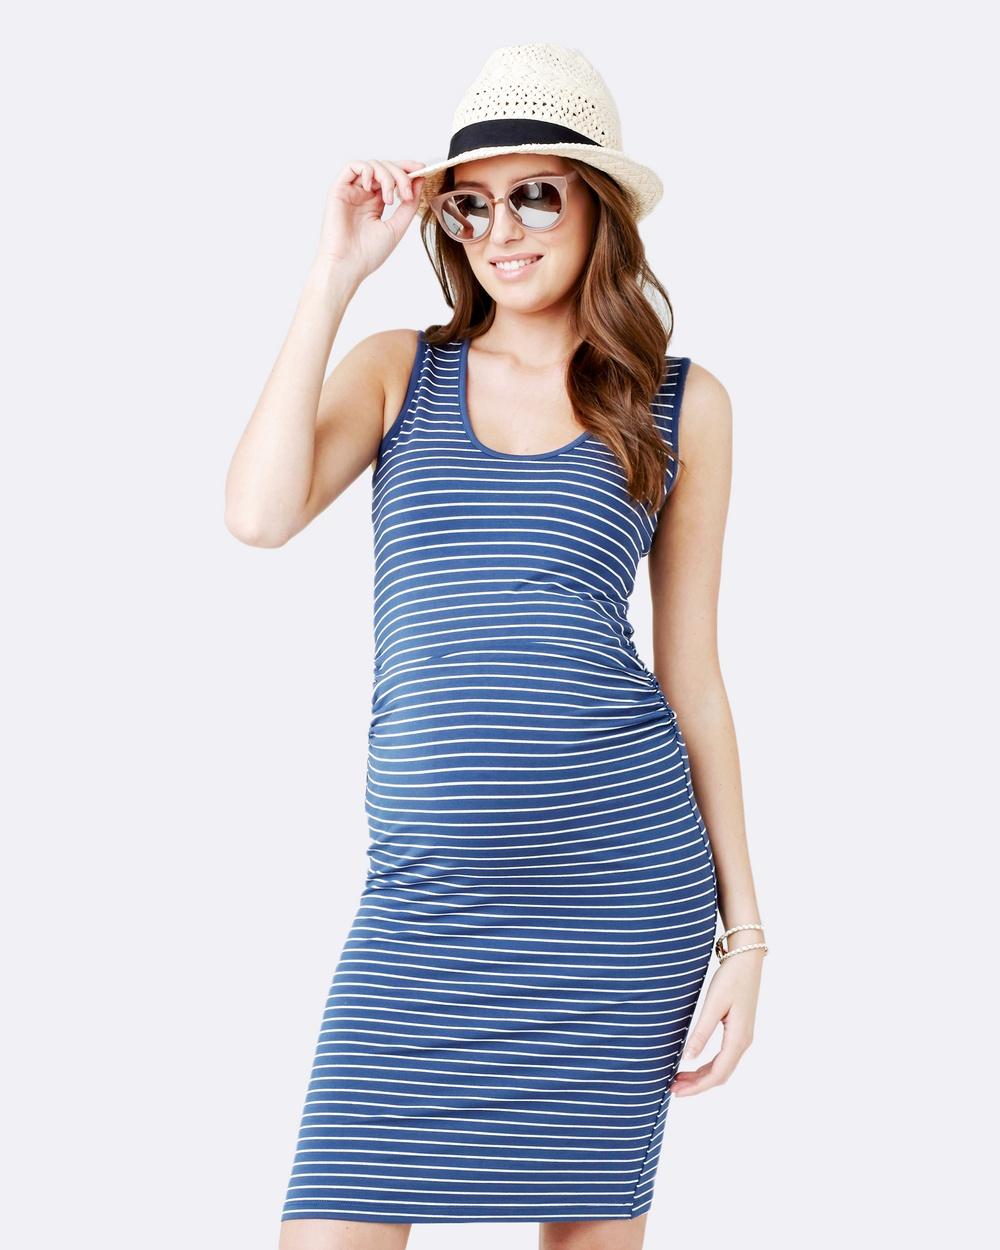 Ripe Maternity Mia Stripe Tank Dress Bodycon Dresses Washed Indigo Mia Stripe Tank Dress